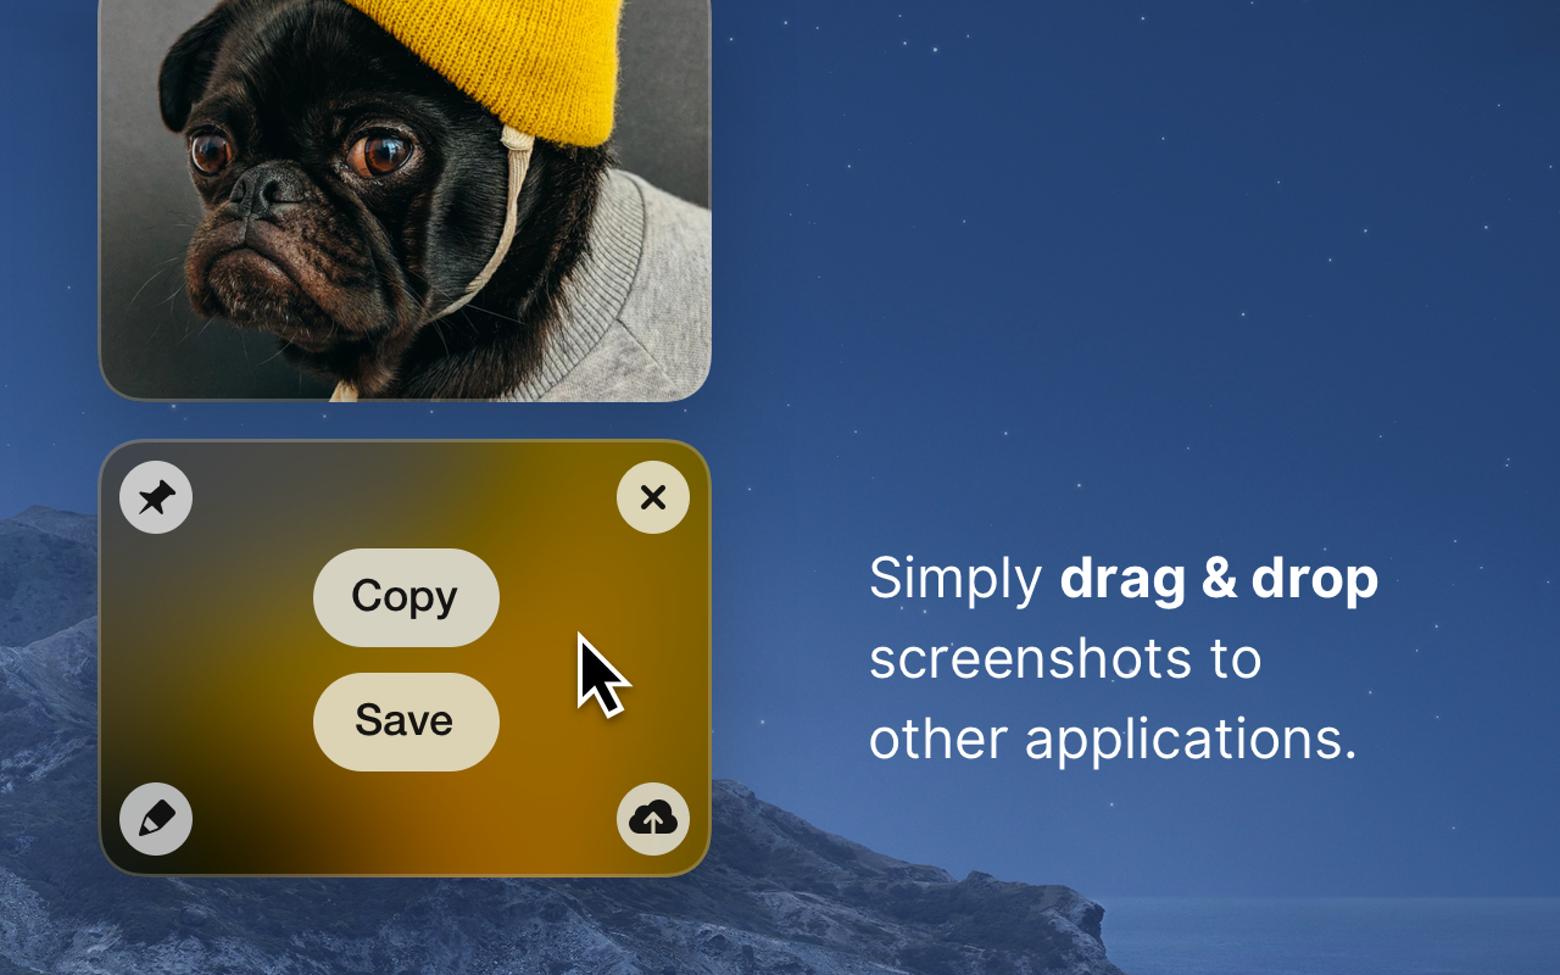 how to save screenshot with cleanshot mac